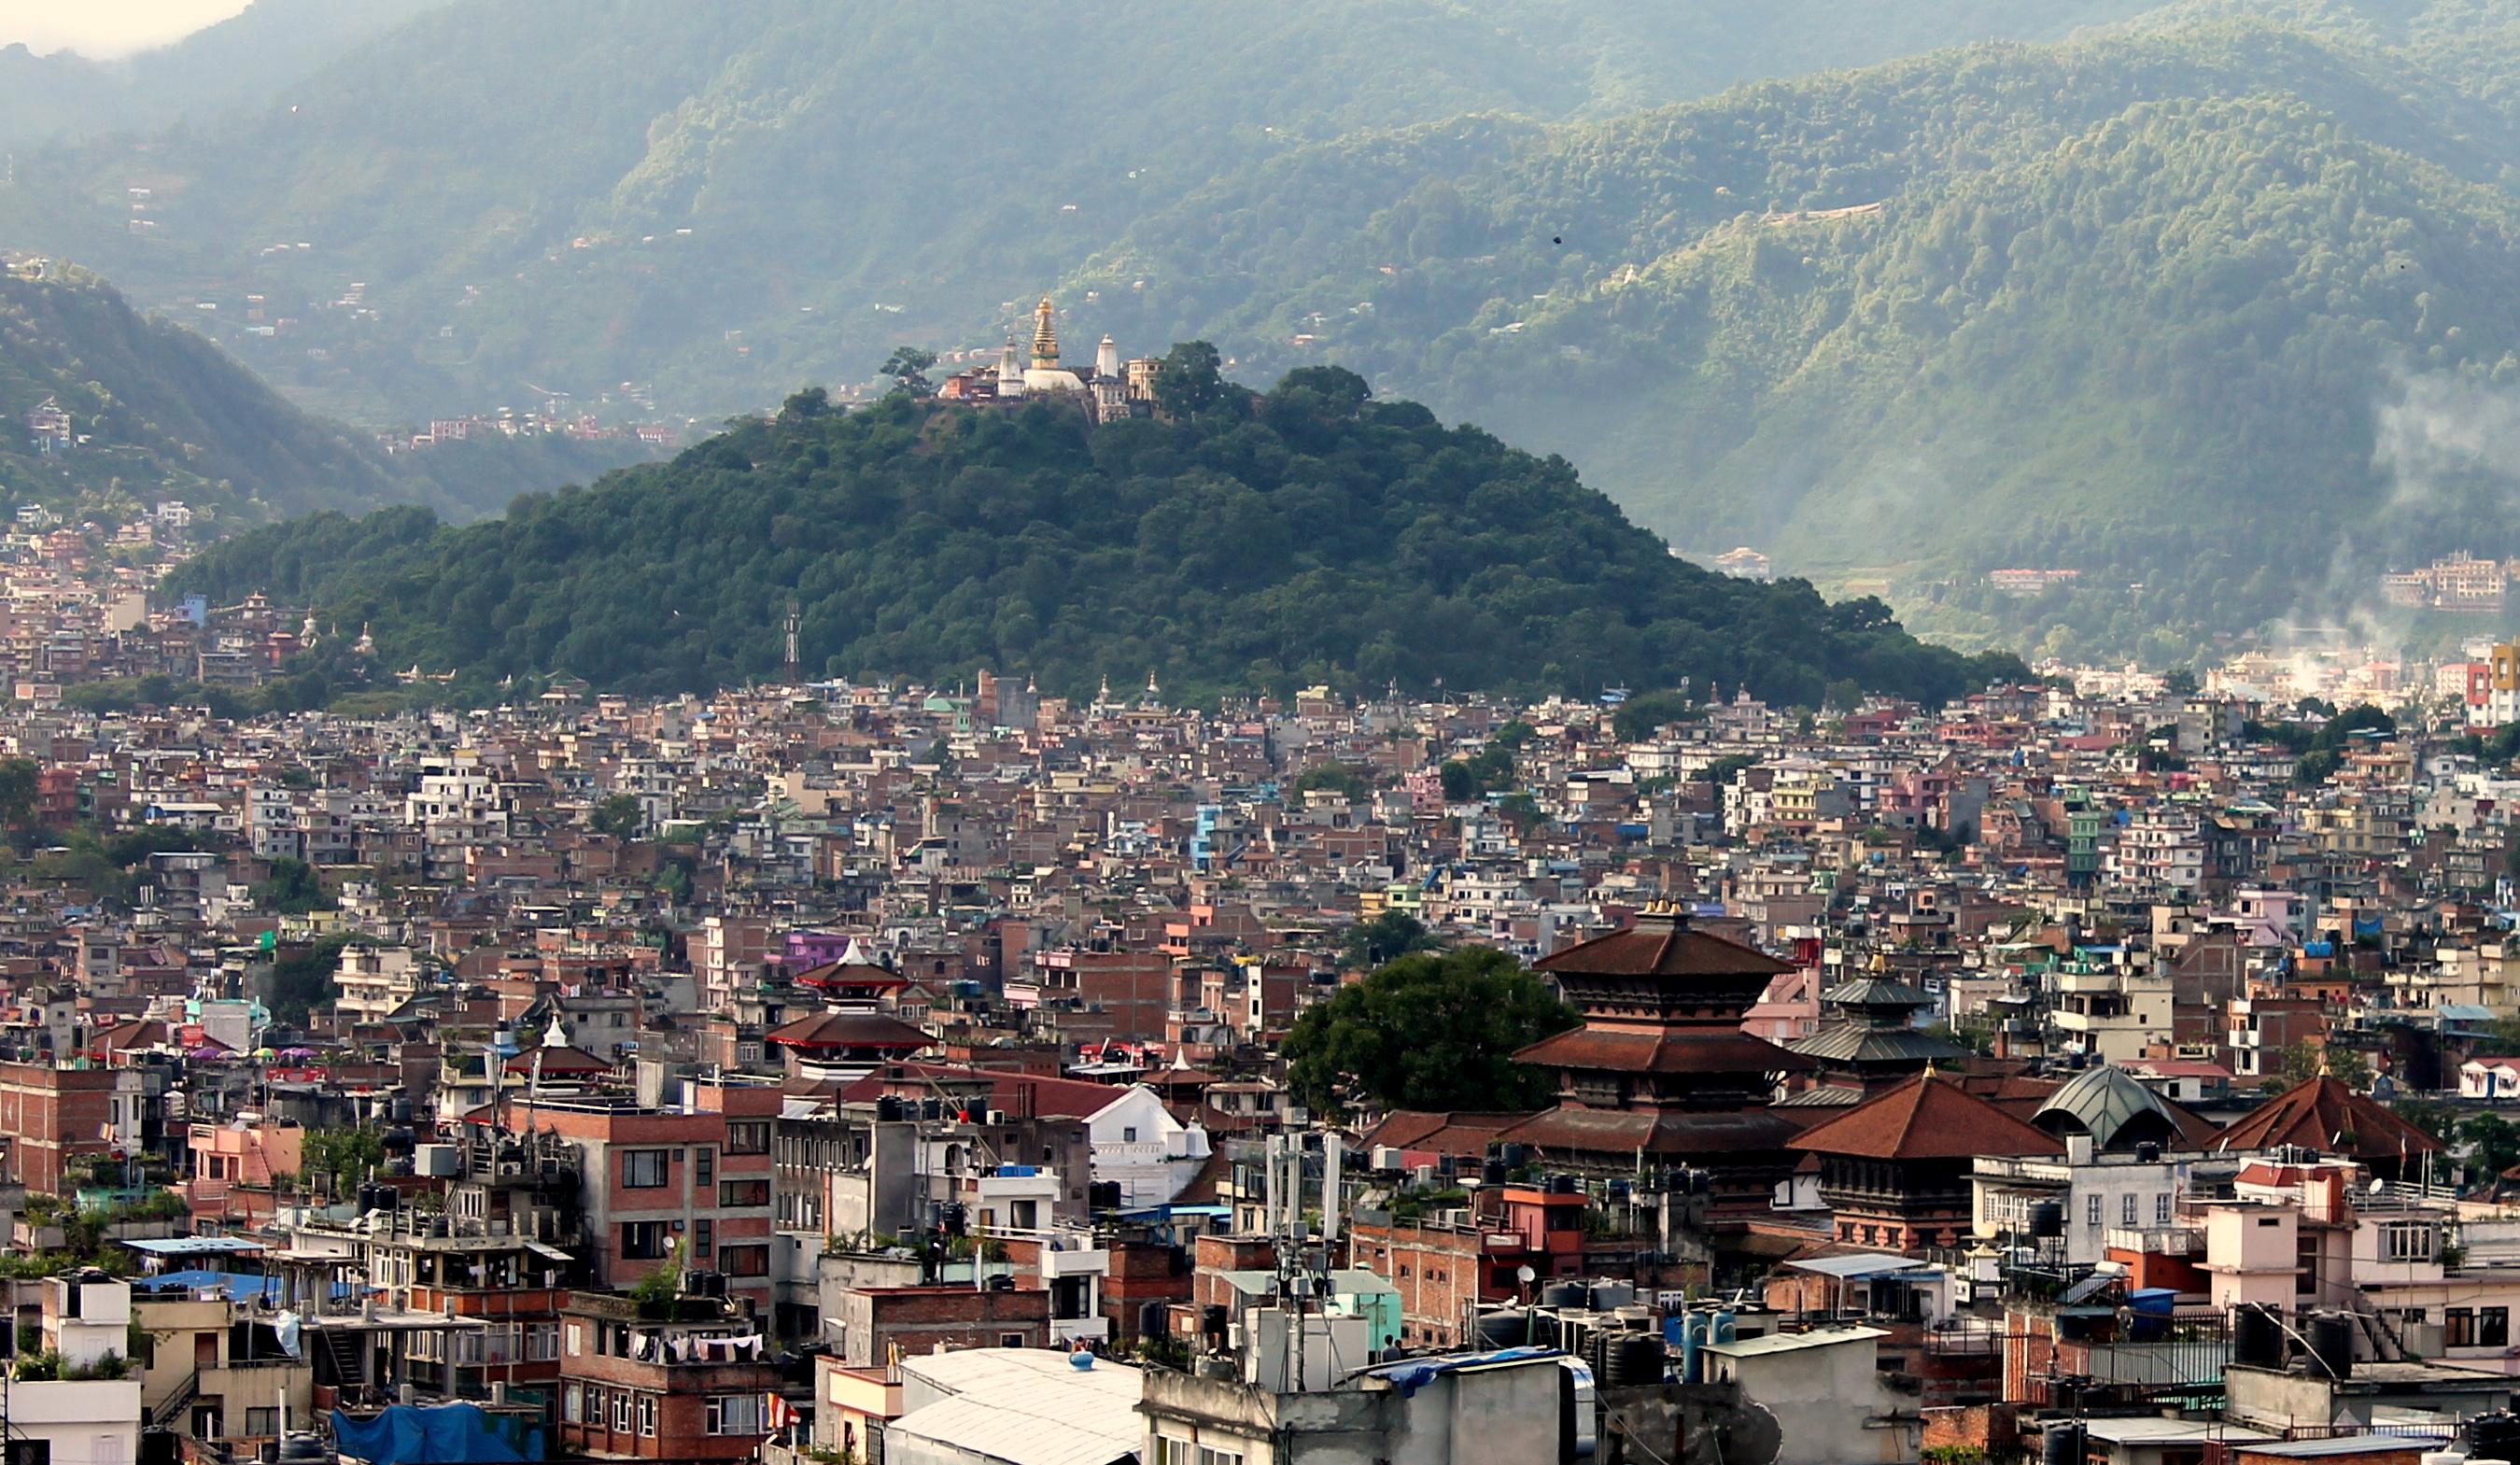 File:Swayambhunath Stupa as seen from Dharahara.JPG - Wikimedia Commons